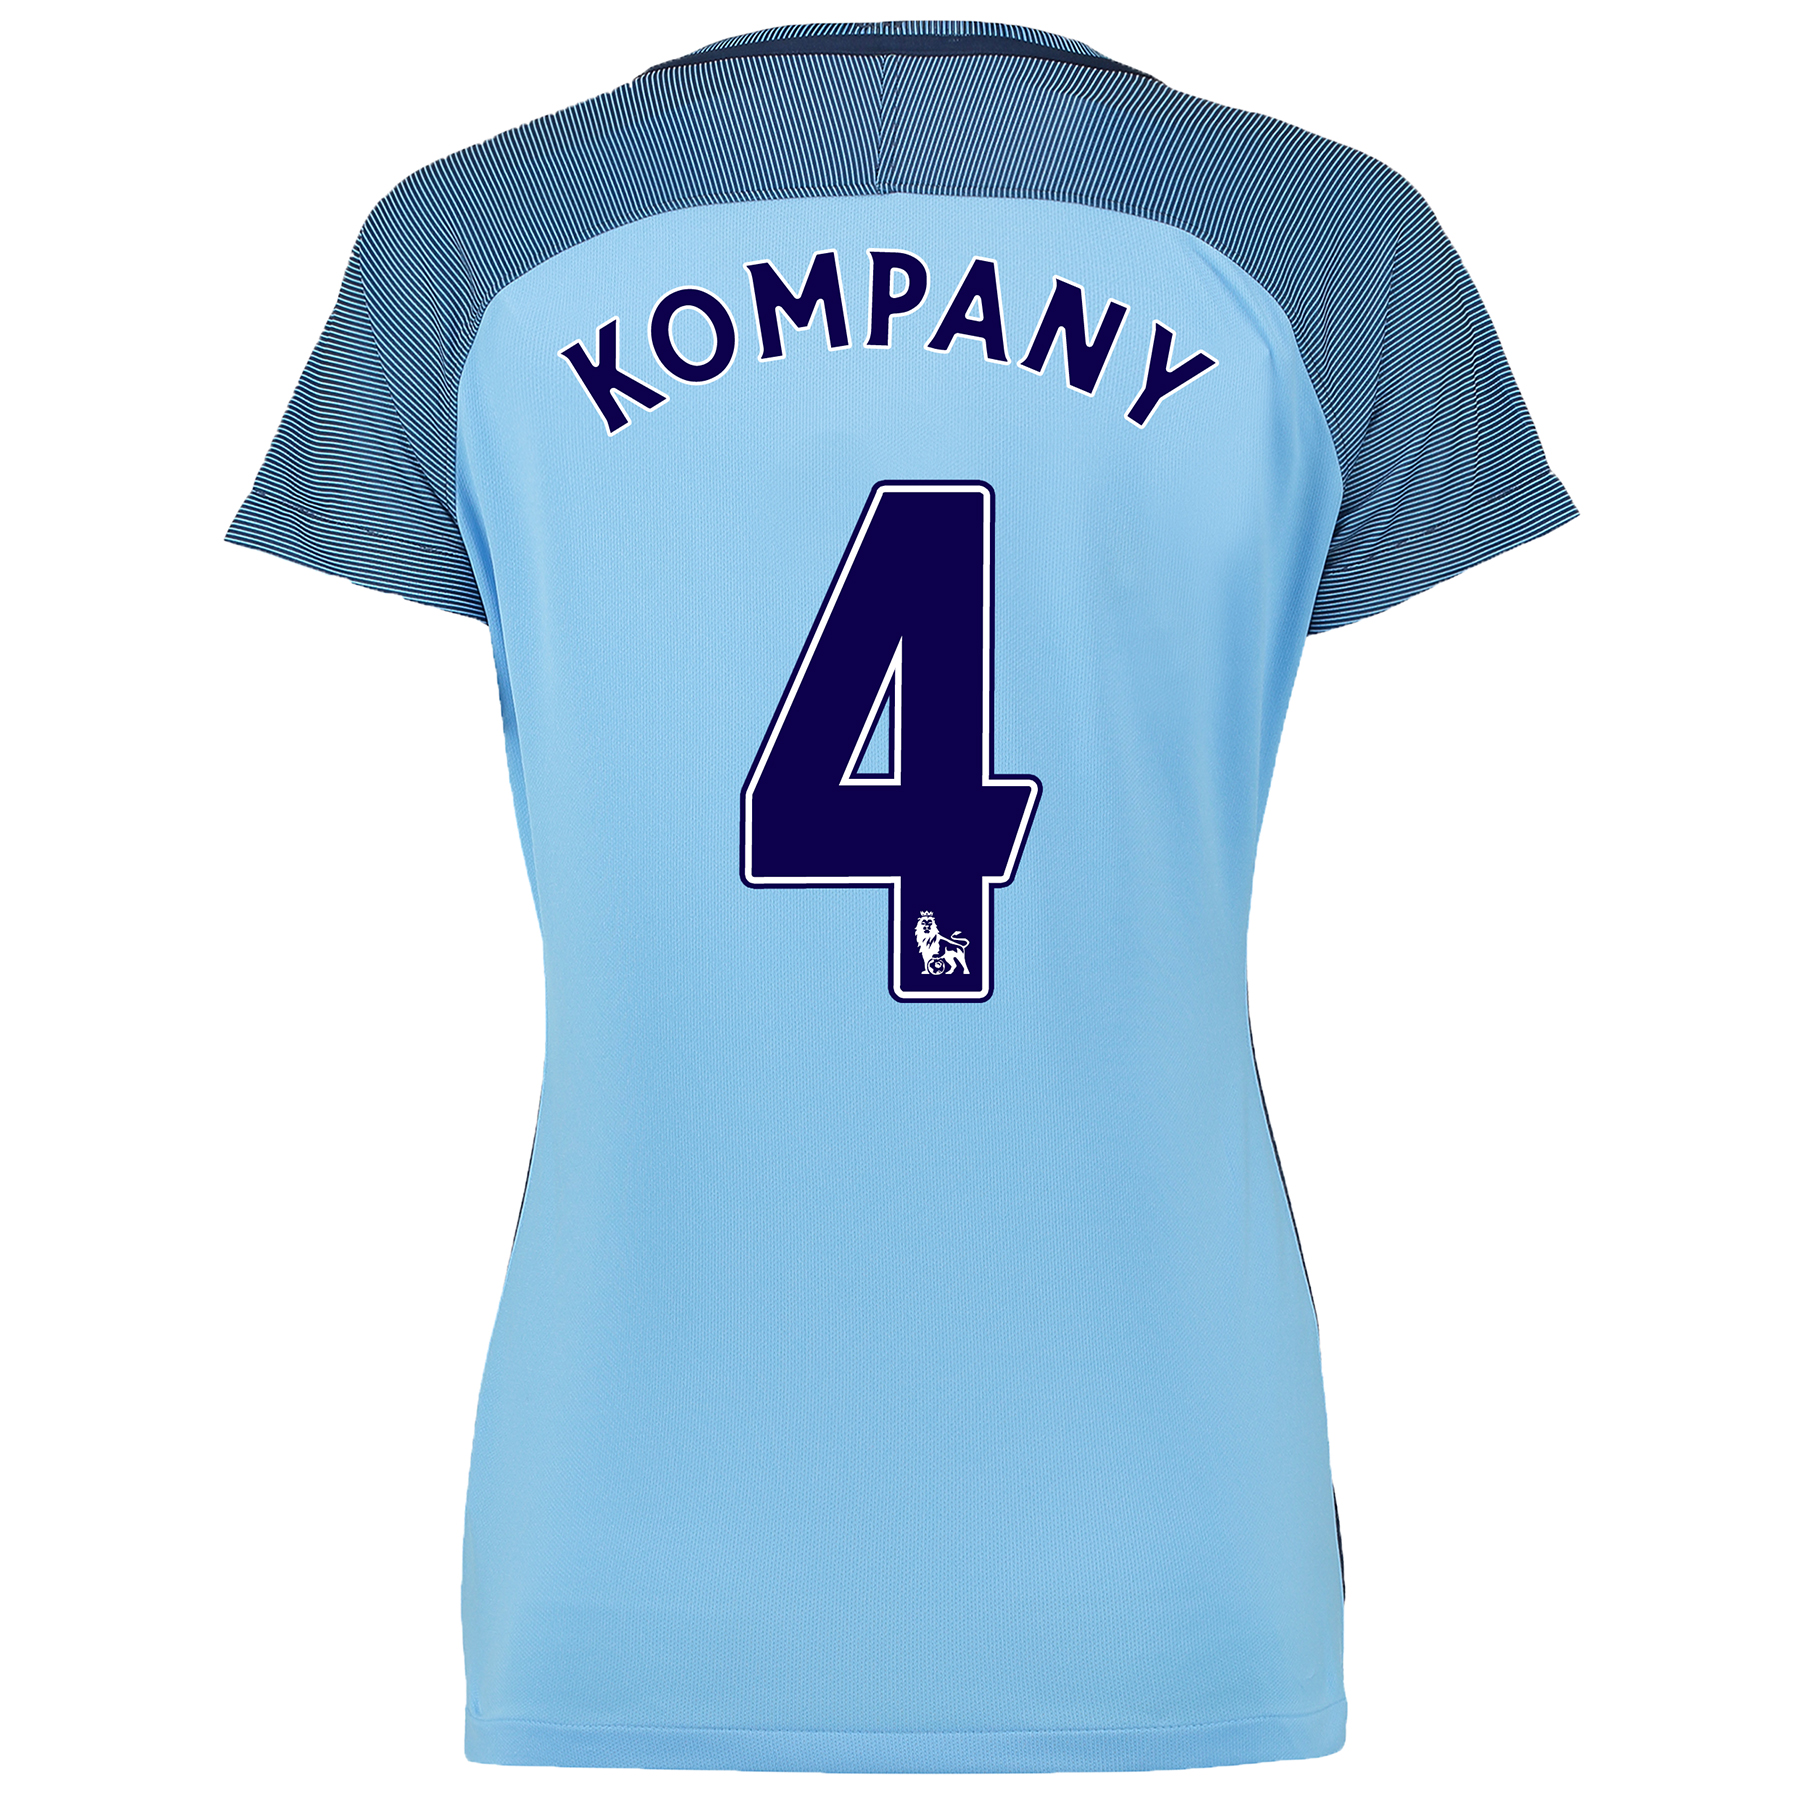 Manchester City Home Shirt 2016-17 - Womens with Kompany 4 printing